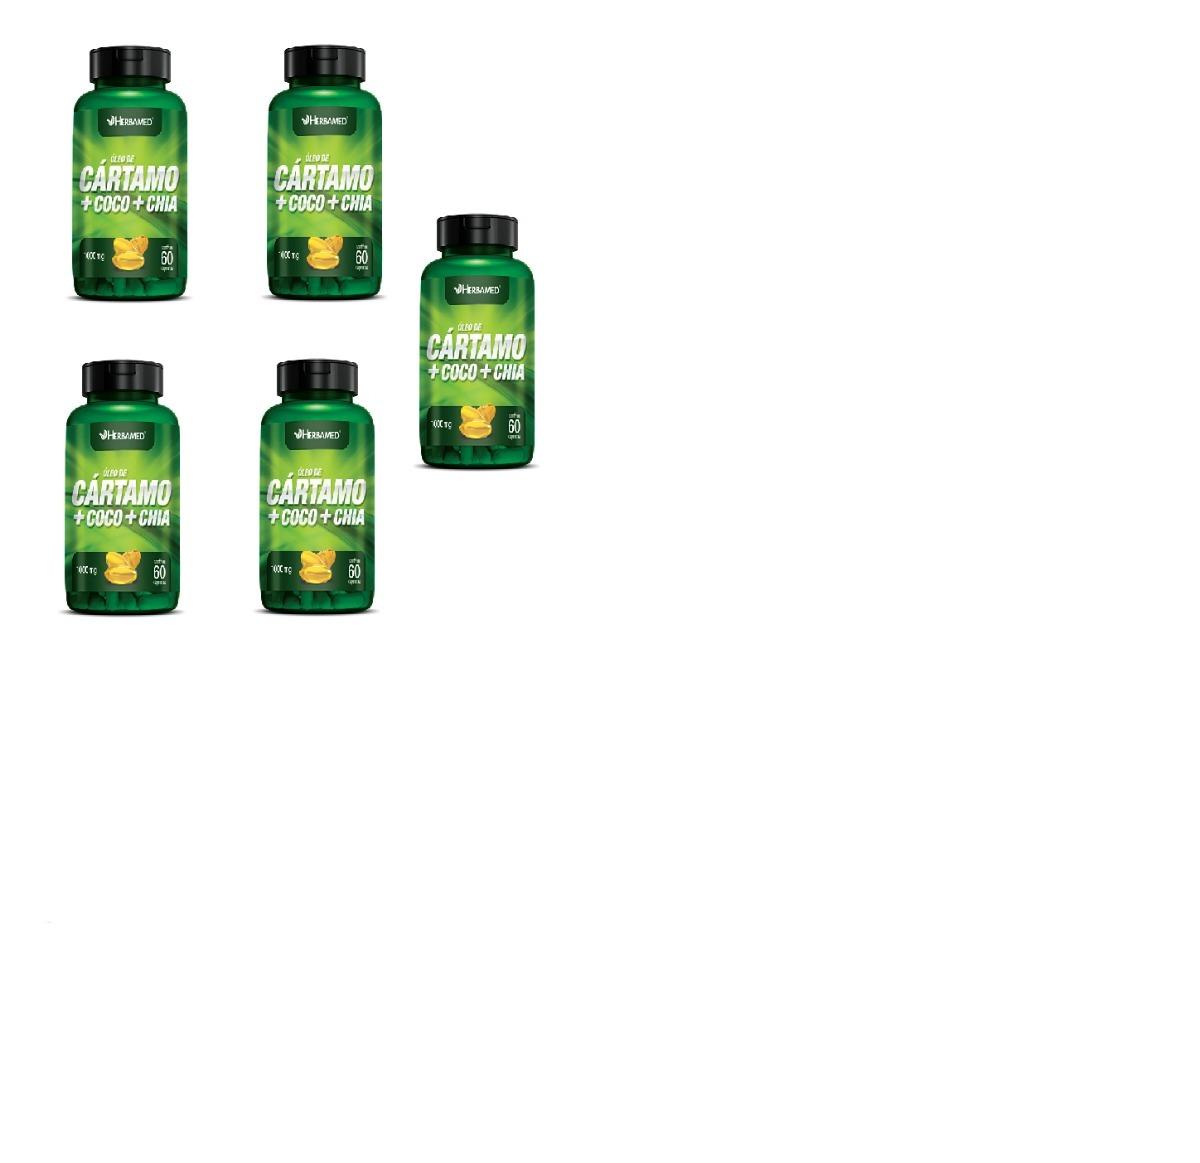 6c2f779f8 kit 5 oleo de cartamo + coco + chia 60cps 1000mg herbamed. Carregando zoom.